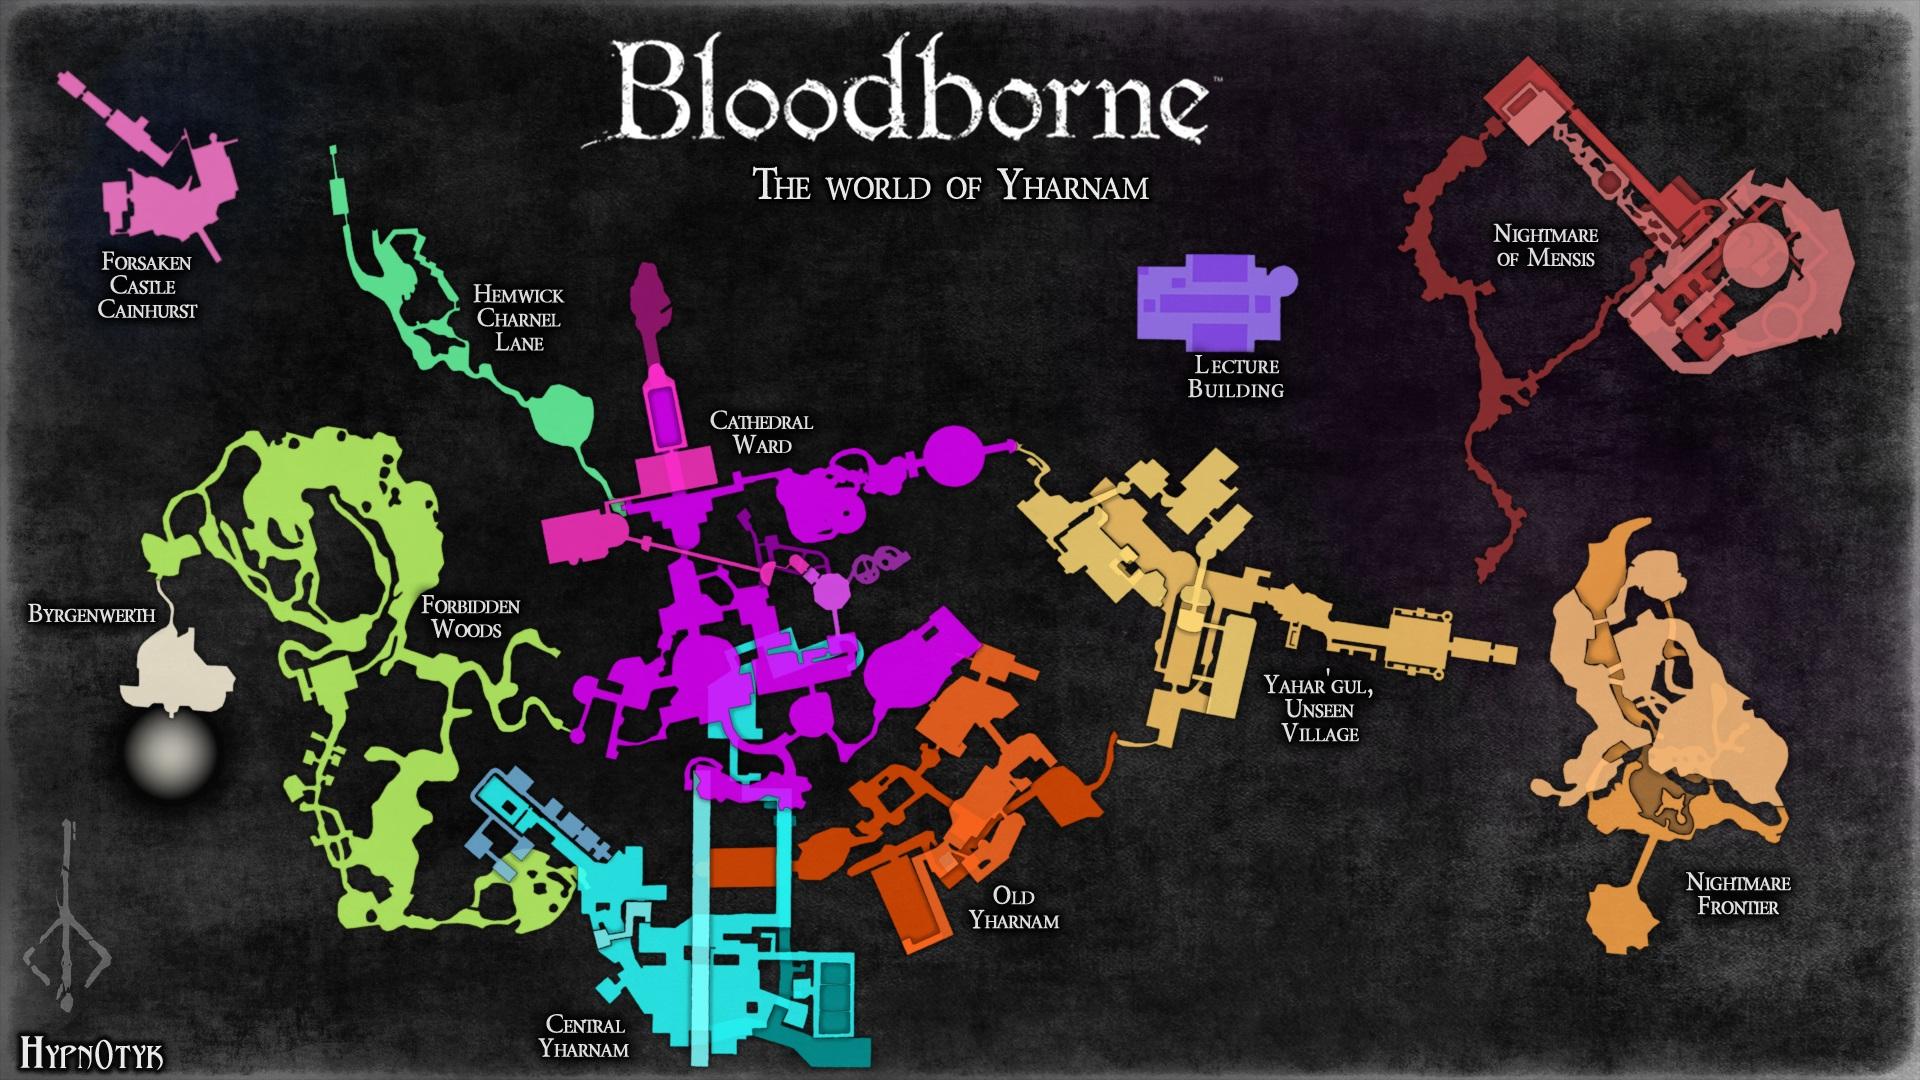 http://guidescroll.com/wp-content/uploads/2015/05/Bloodborne-Complete-Map.jpg